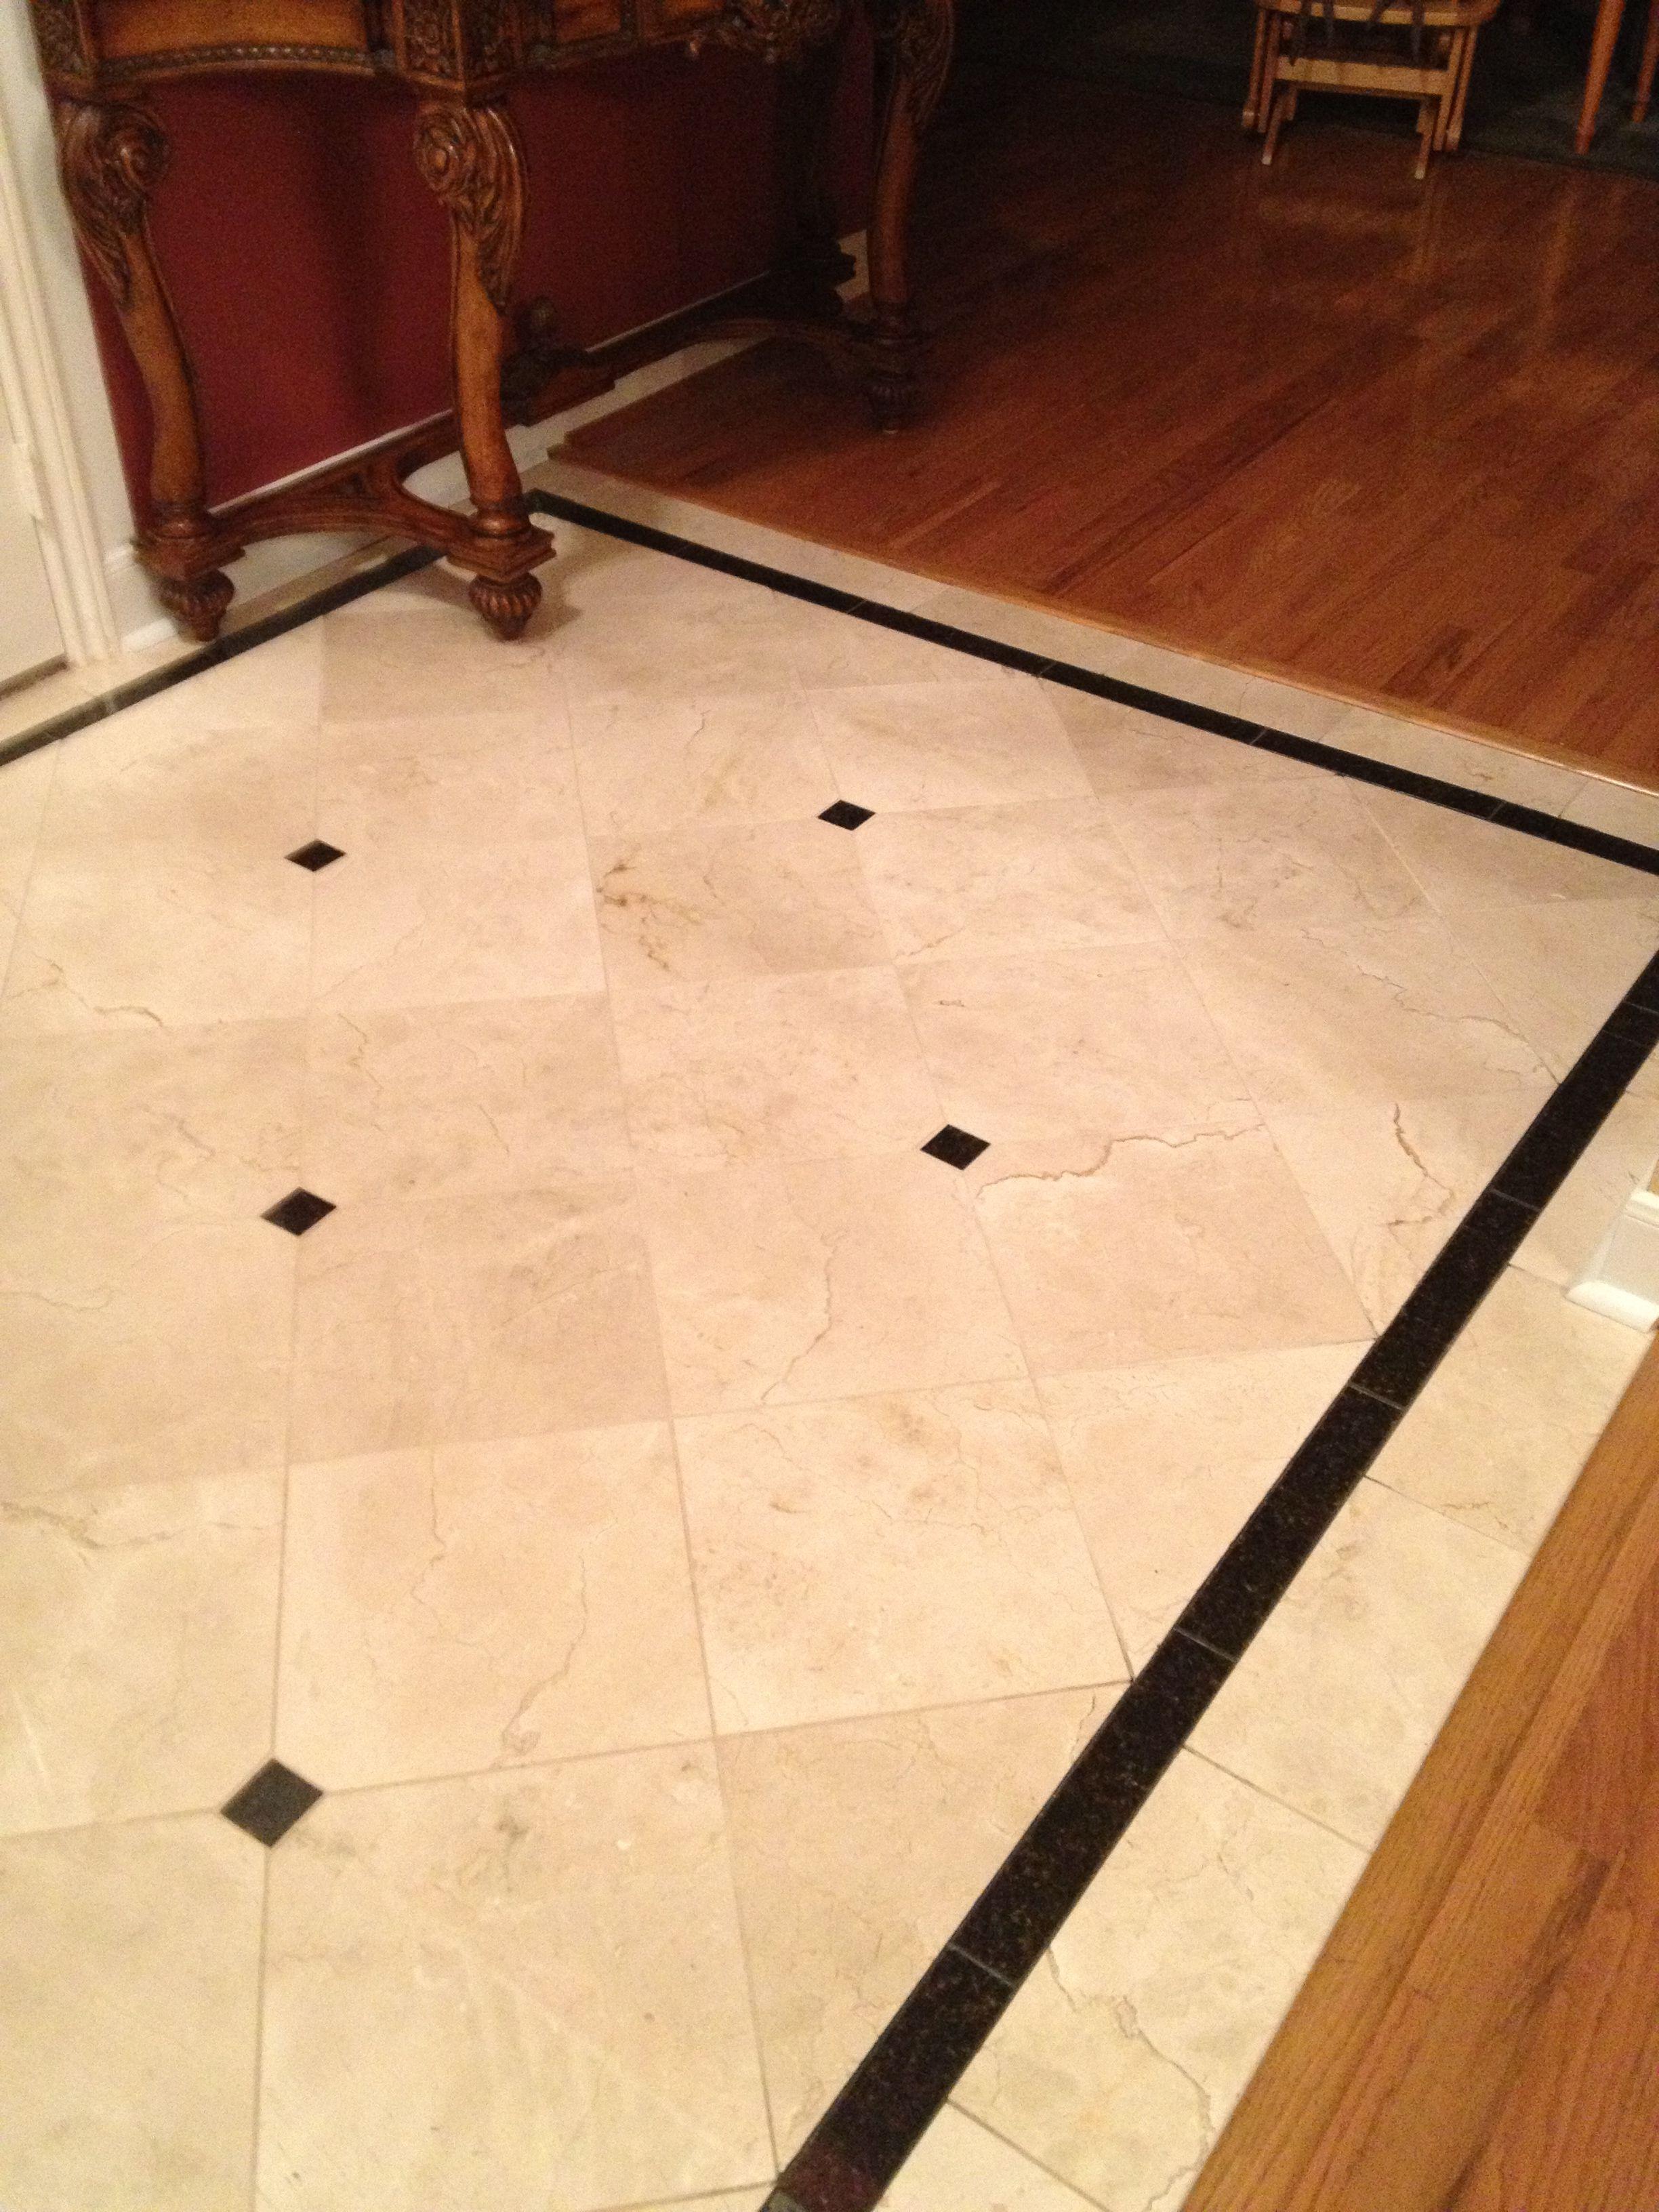 Floor Tile Designs Ideas To Enhance Your Floor Appearance: Tiles, Entryway Flooring, Entryway